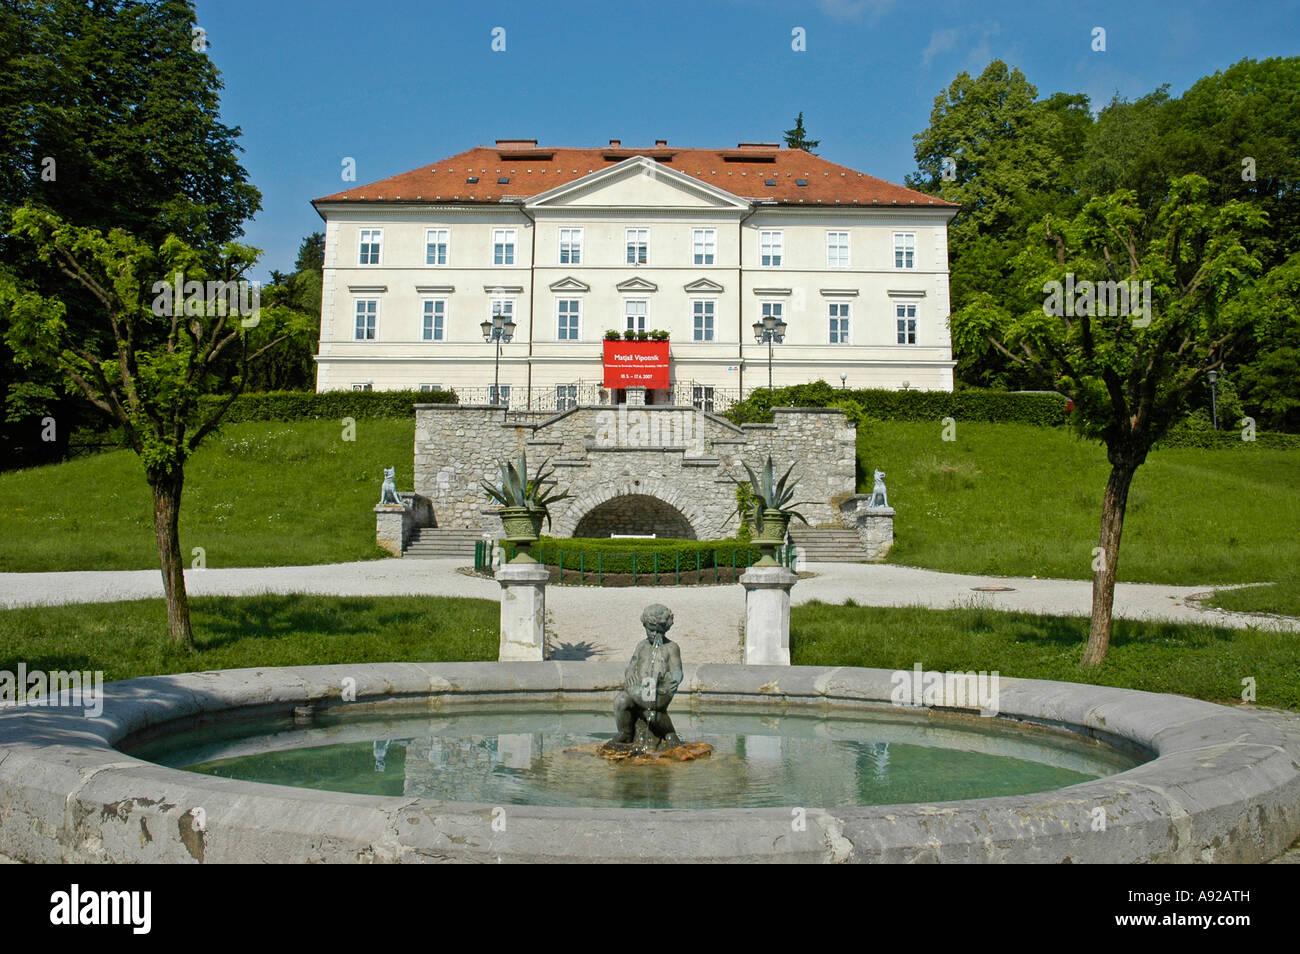 Tivoli castle, international graphic art centre, Ljubljana, Slovenia - Stock Image